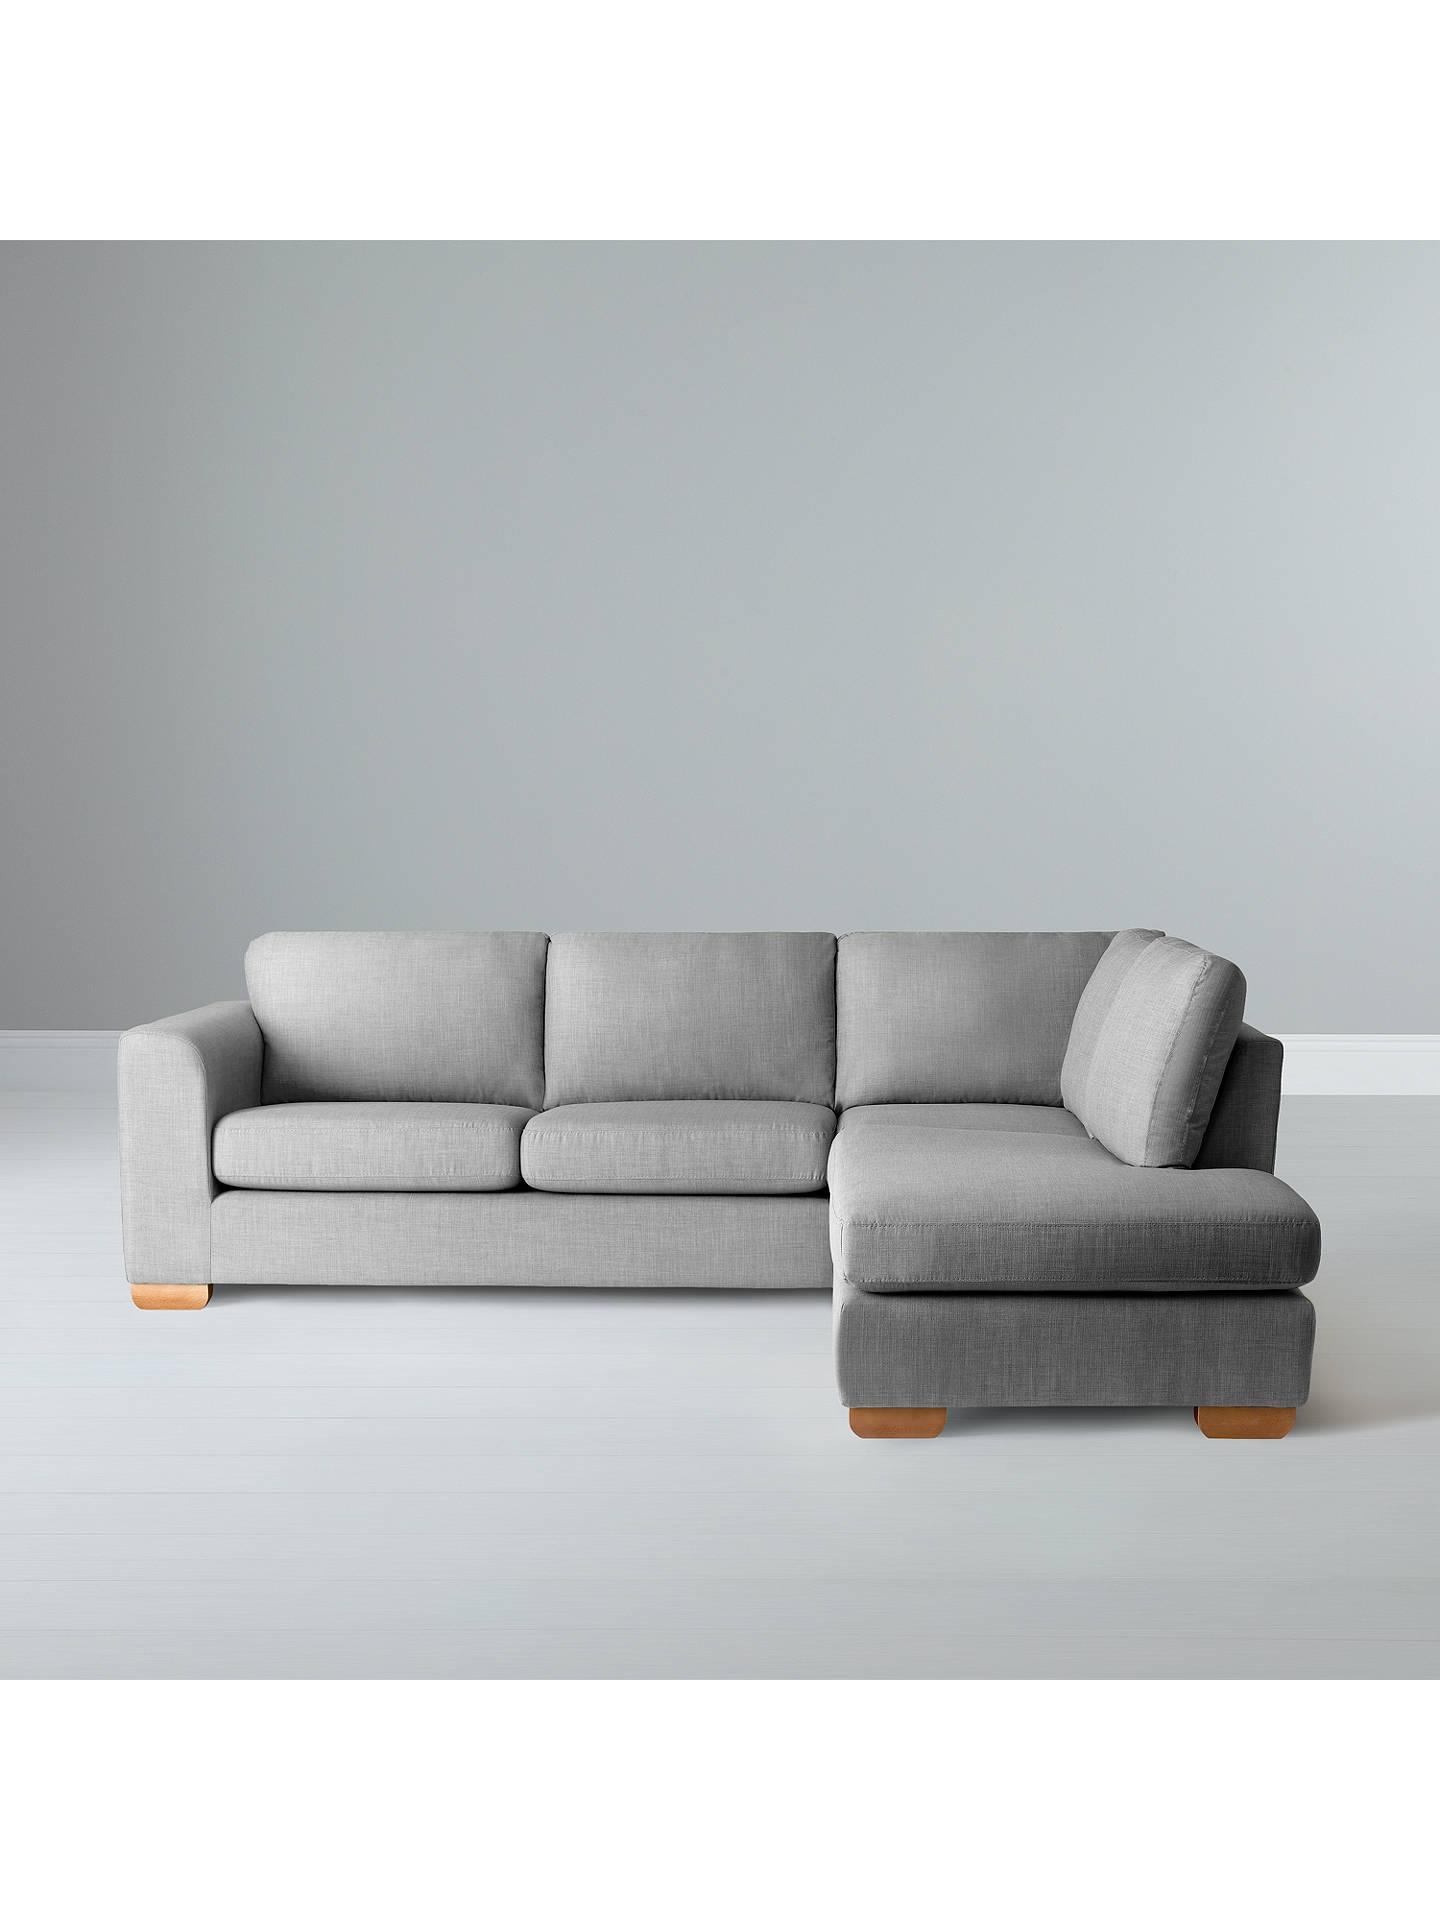 John Lewis Amp Partners Felix Rhf Corner Chaise End Sofa